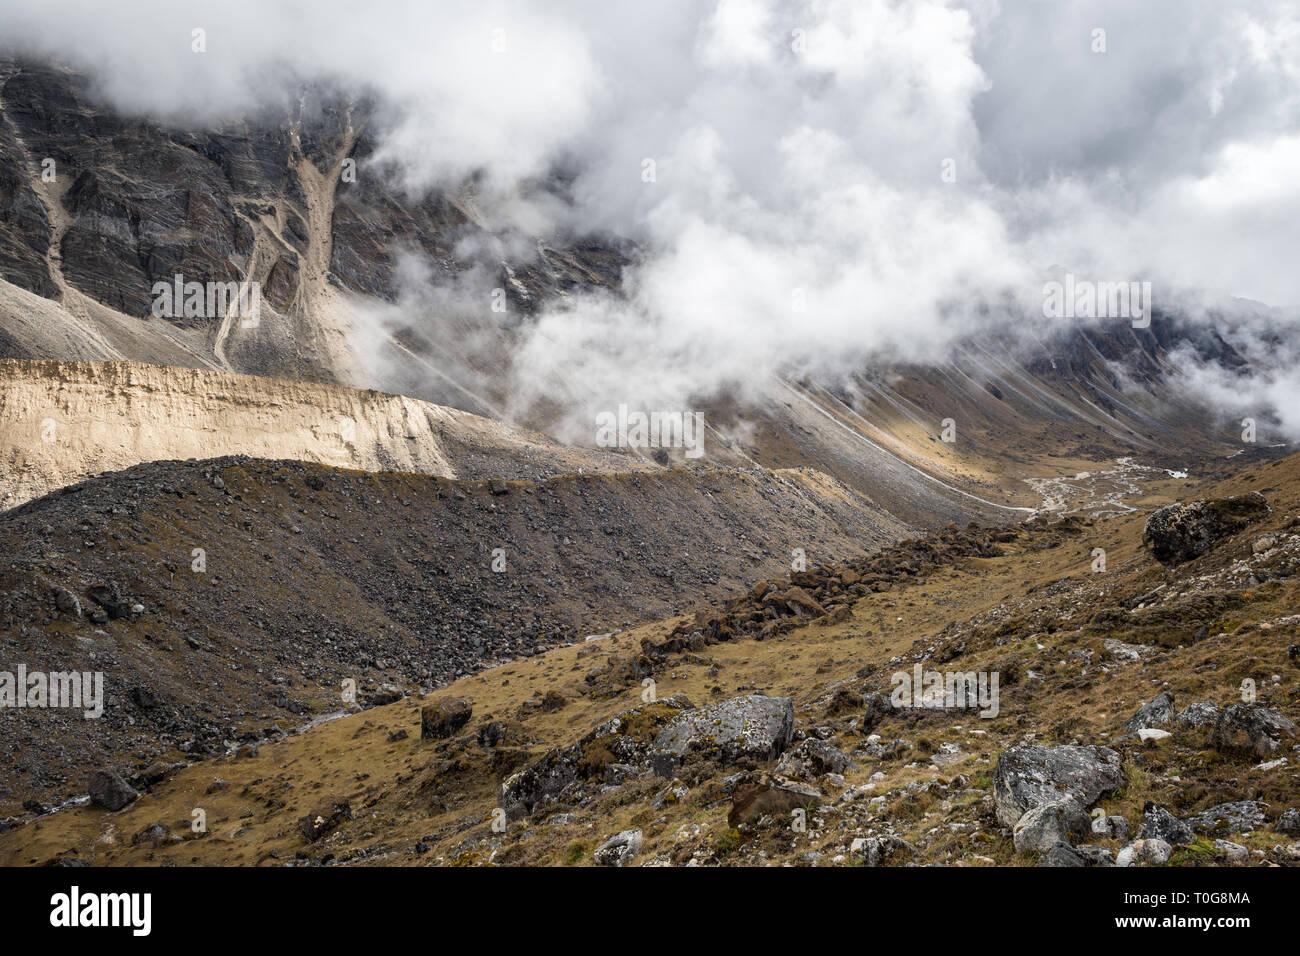 Valley en route to Narethang, Gasa District, Snowman Trek, Bhutan Stock Photo